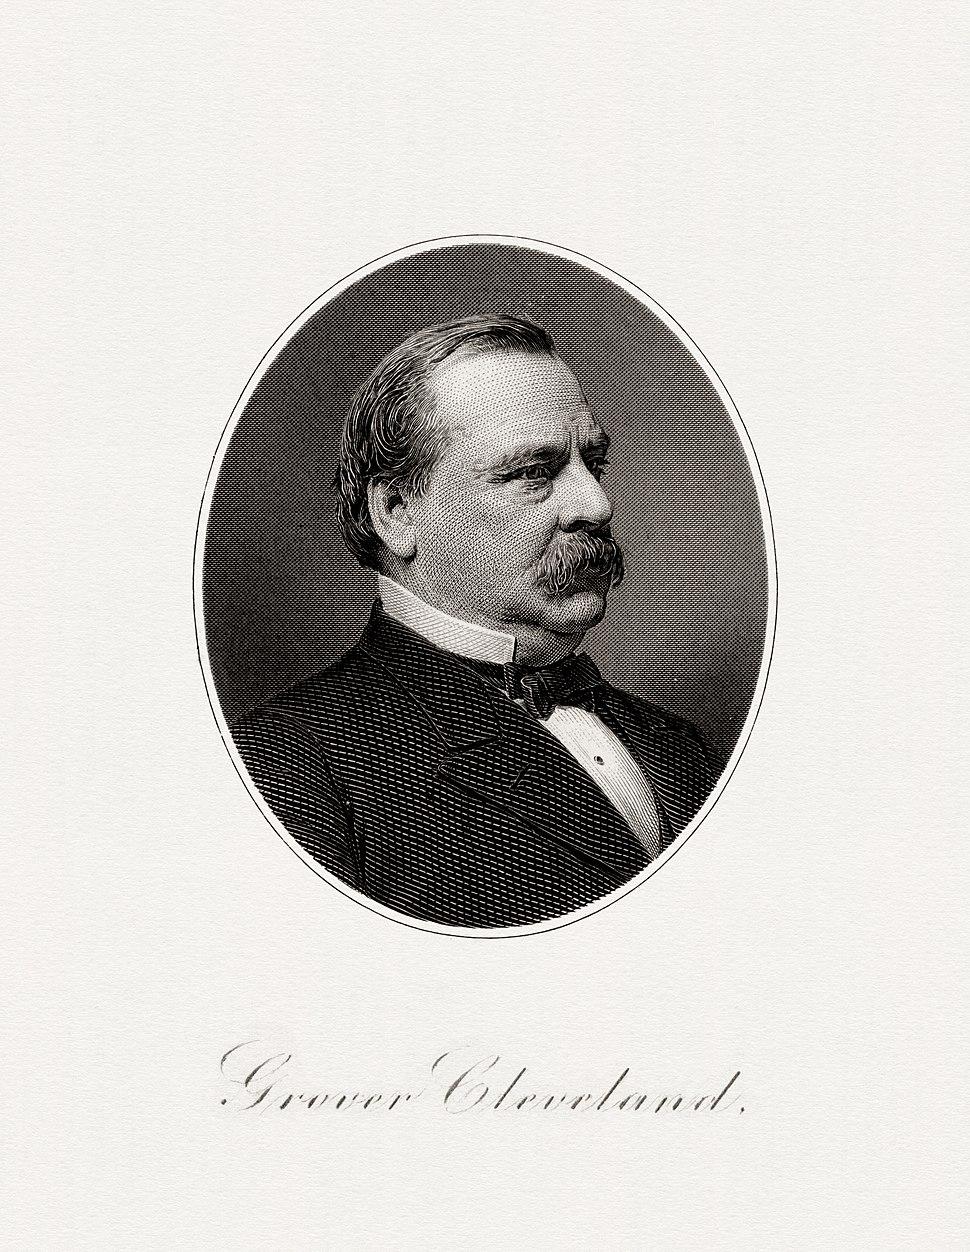 CLEVELAND, Grover-President (BEP engraved portrait)